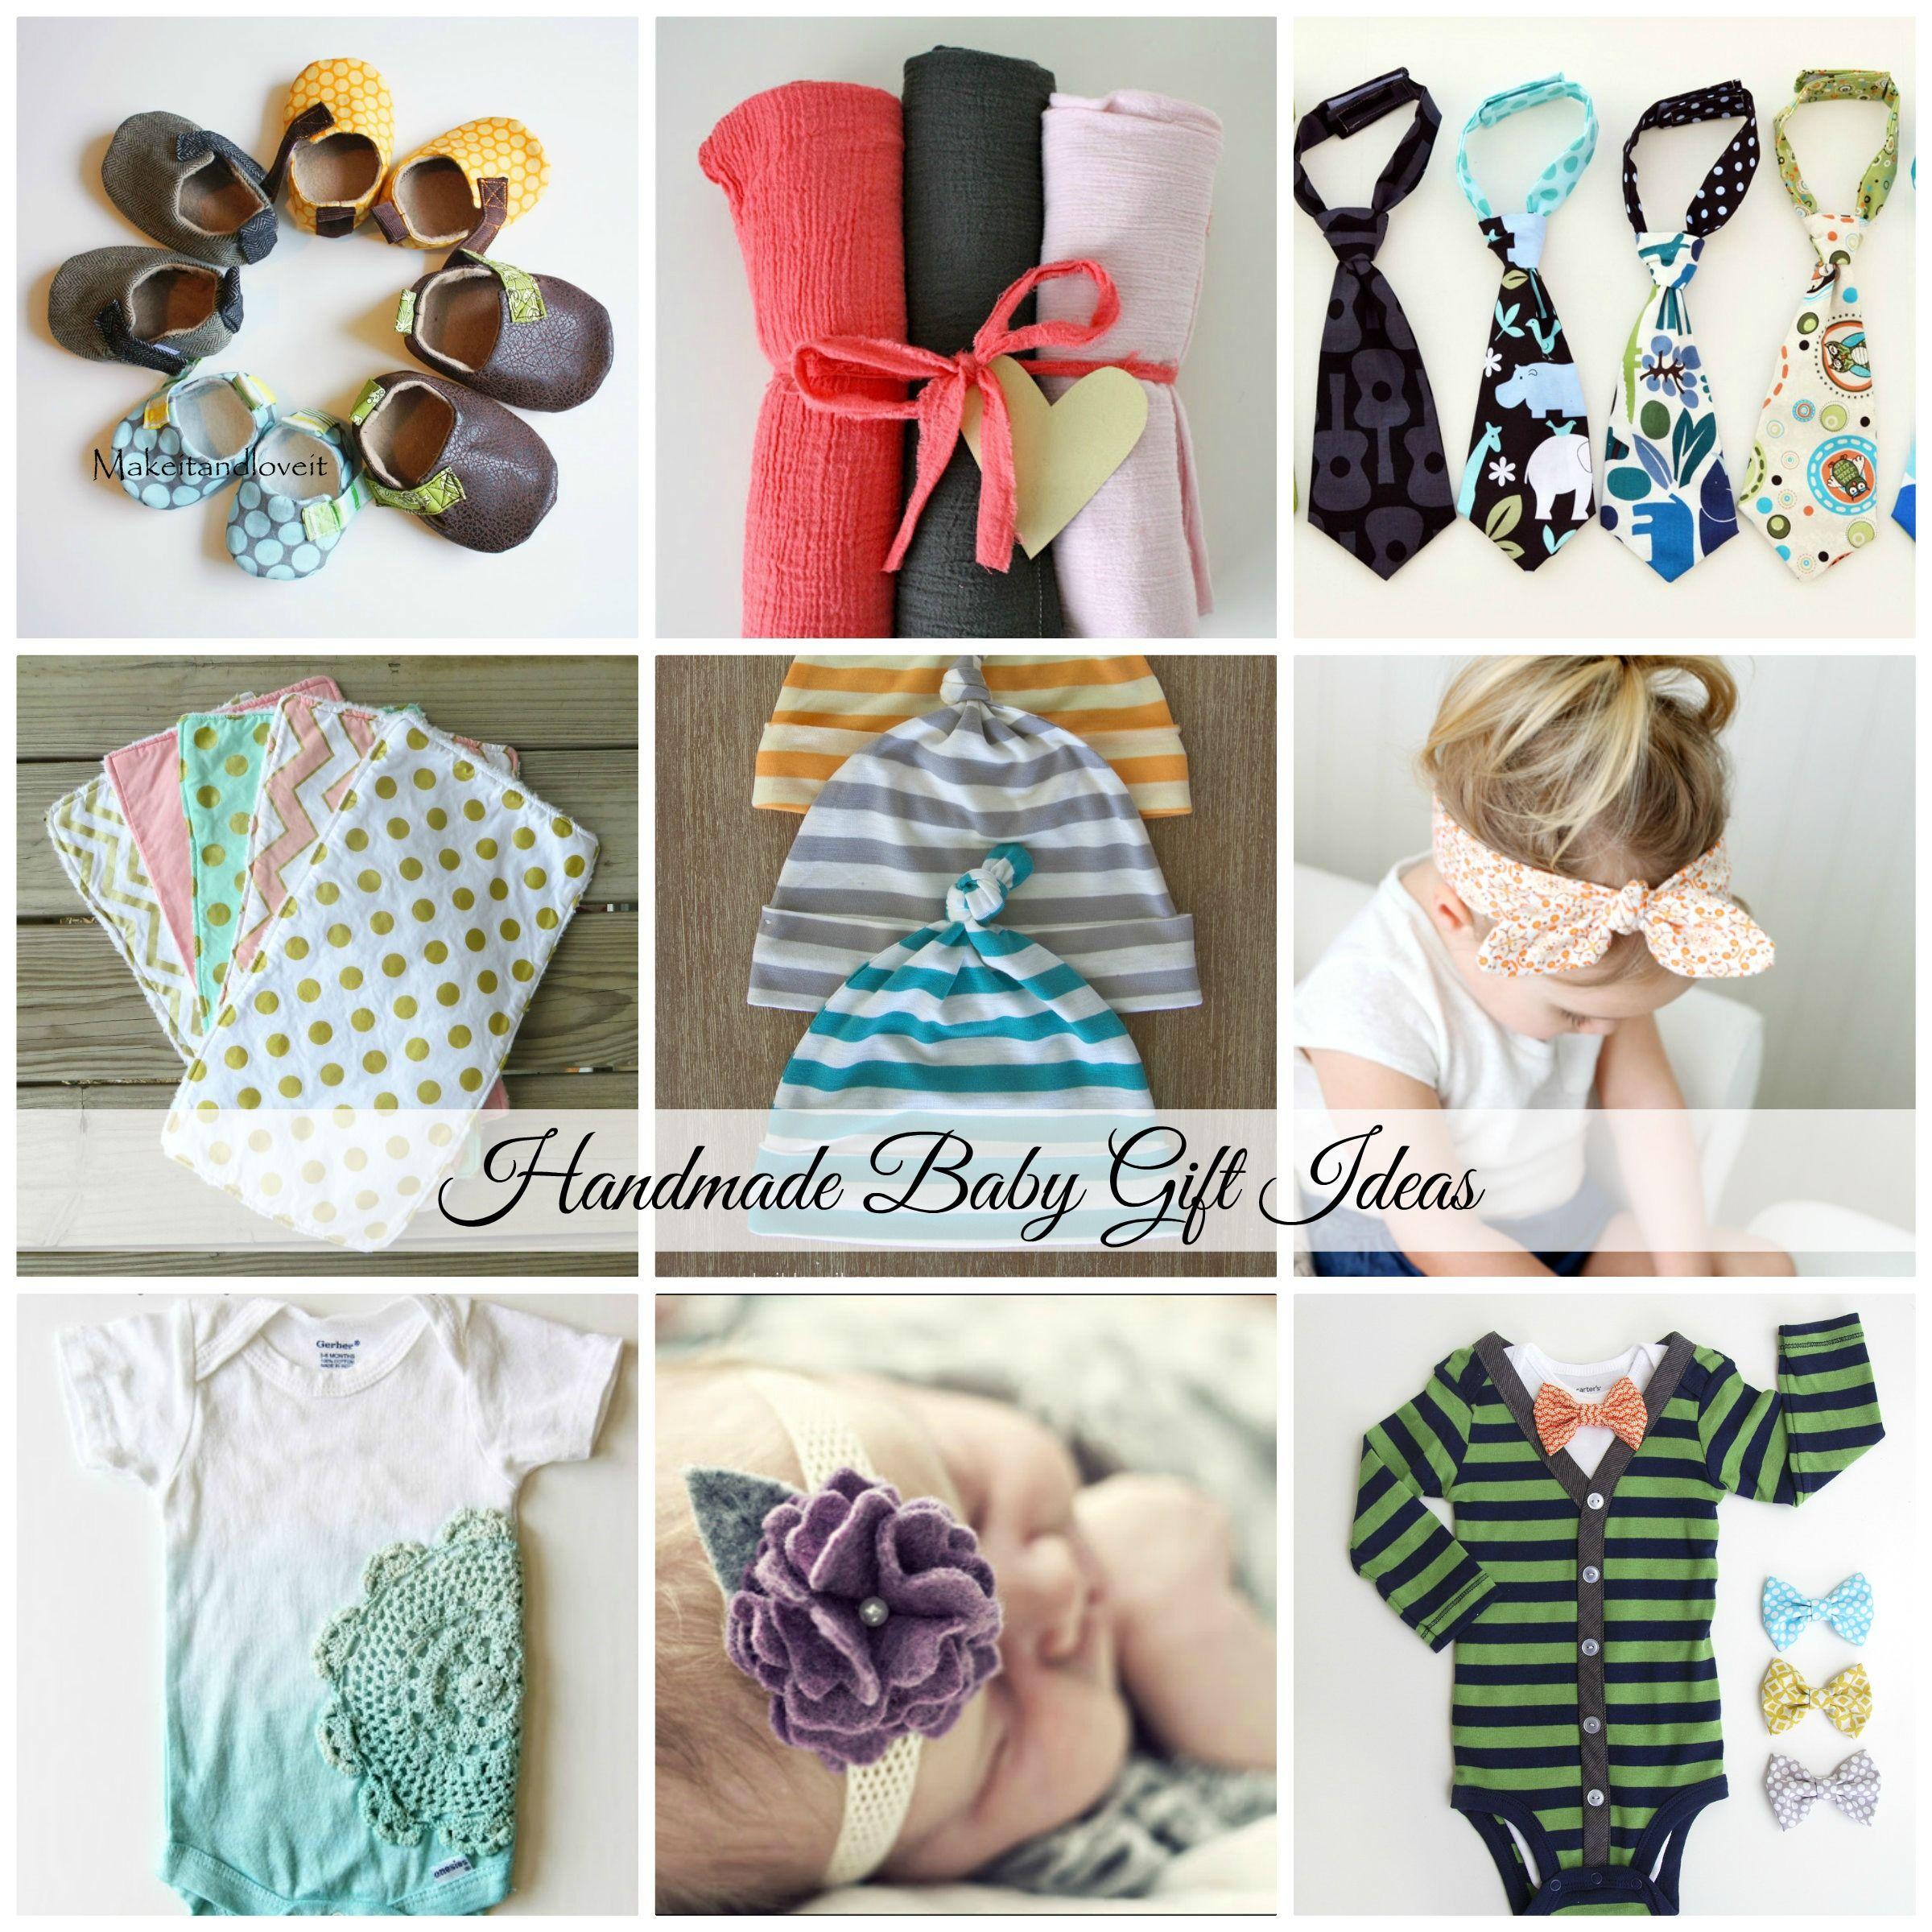 Handmade Baby Gift Ideas | Handmade baby, Babies and Gift